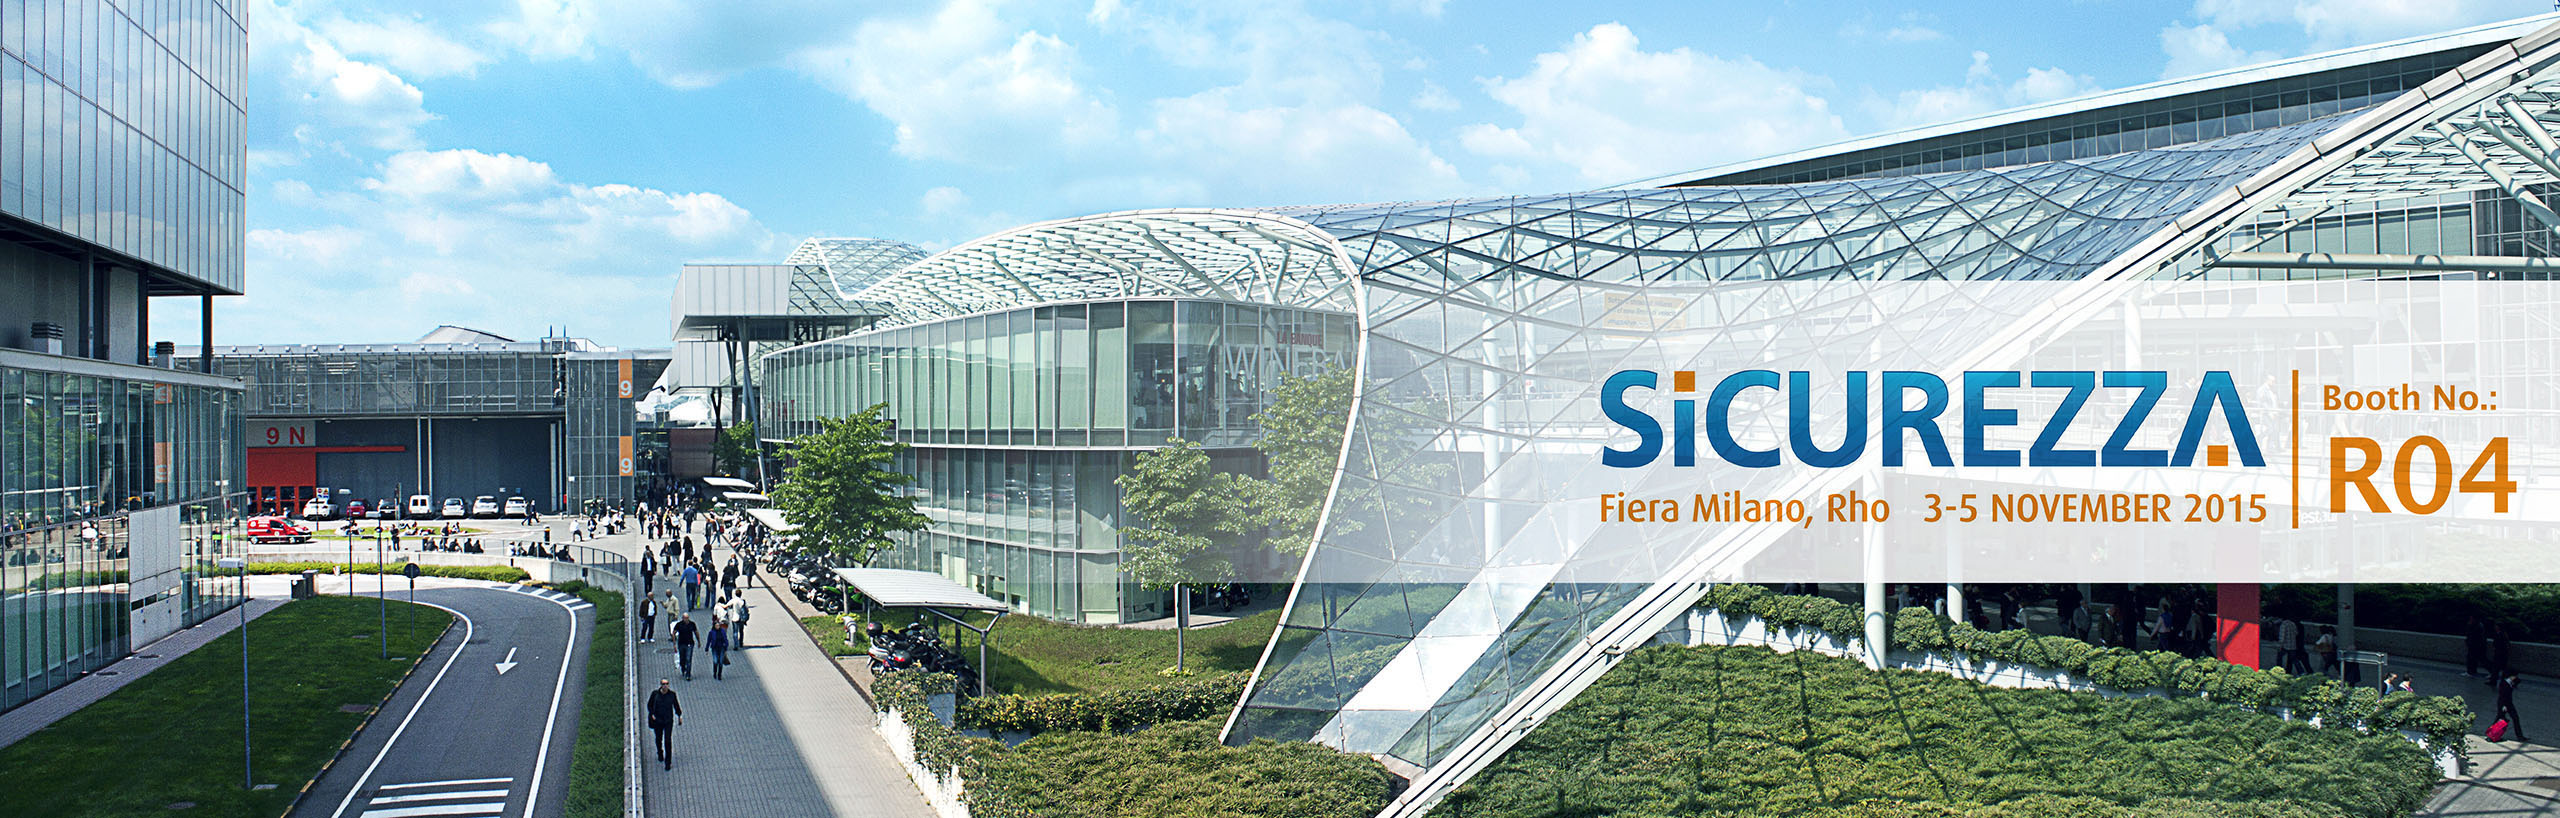 VIVOTEK to Unveil Dedicated Vertical Surveillance Solutions at SICUREZZA 2015, Italy